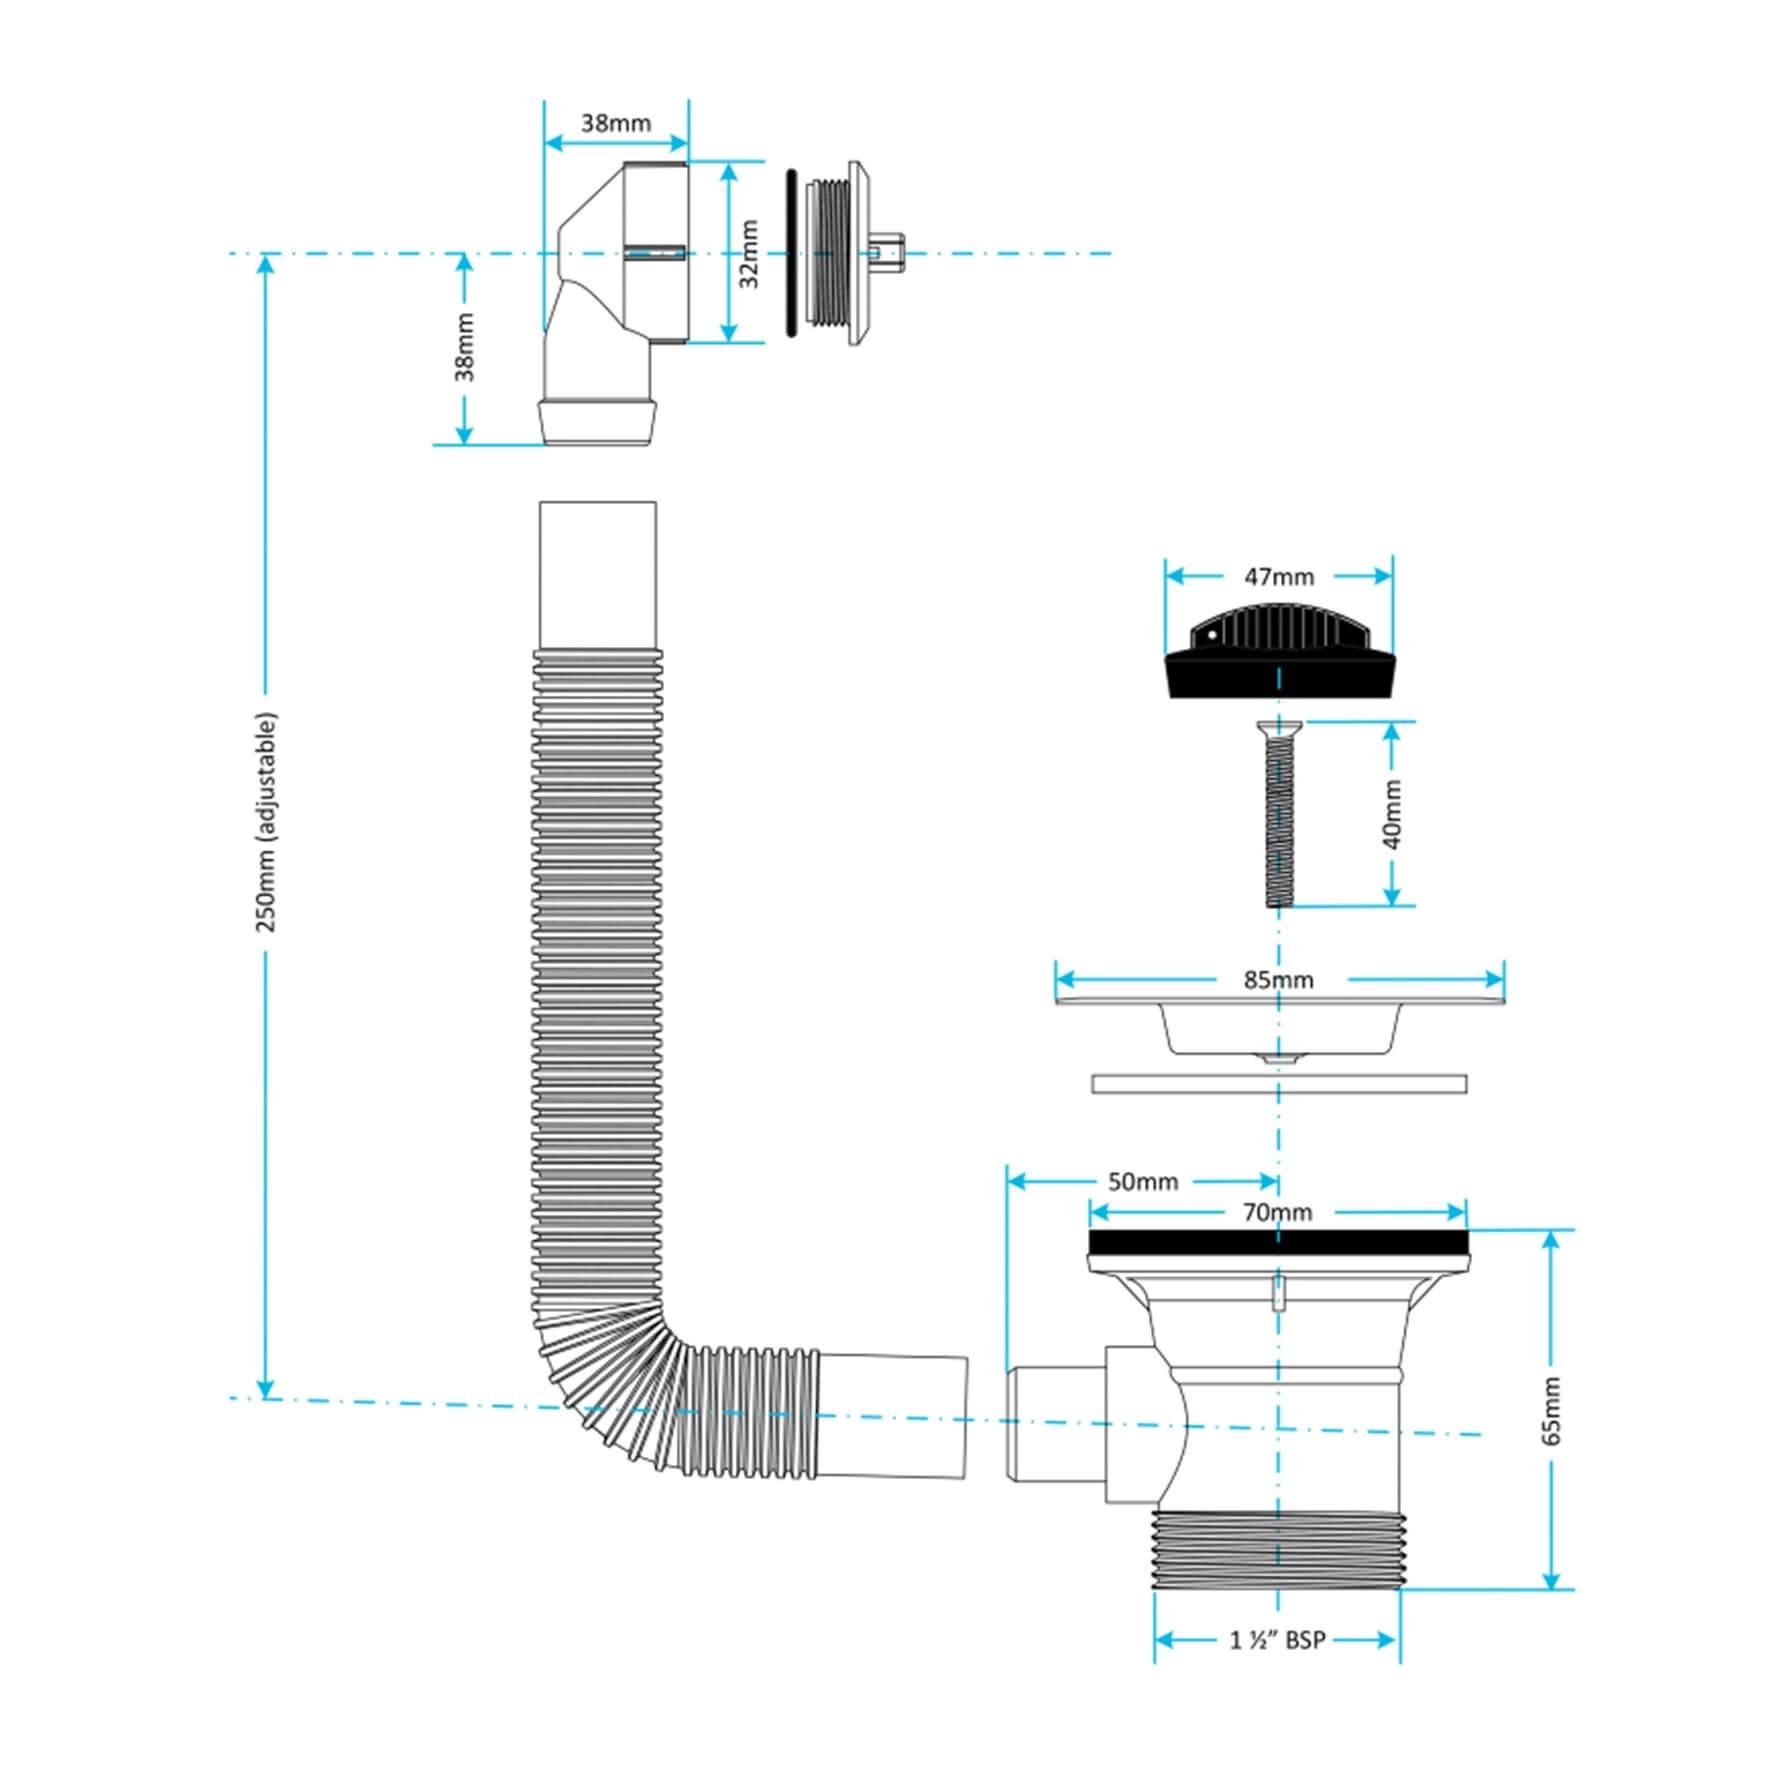 Viva Combi Sink Waste CWS01 measurements